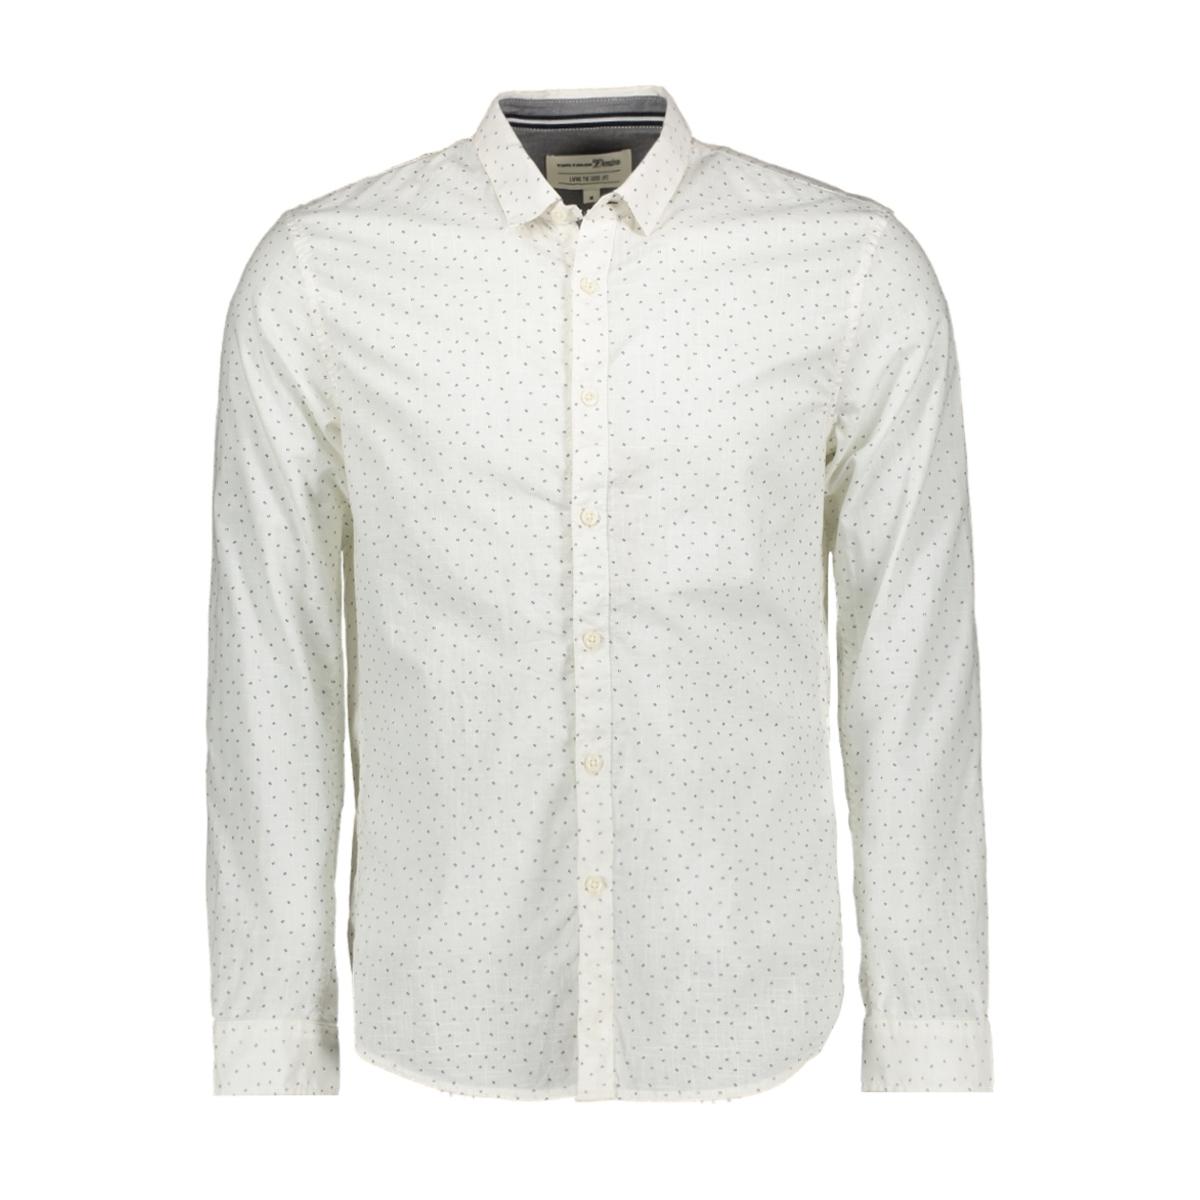 1010357xx12 tom tailor overhemd 17252